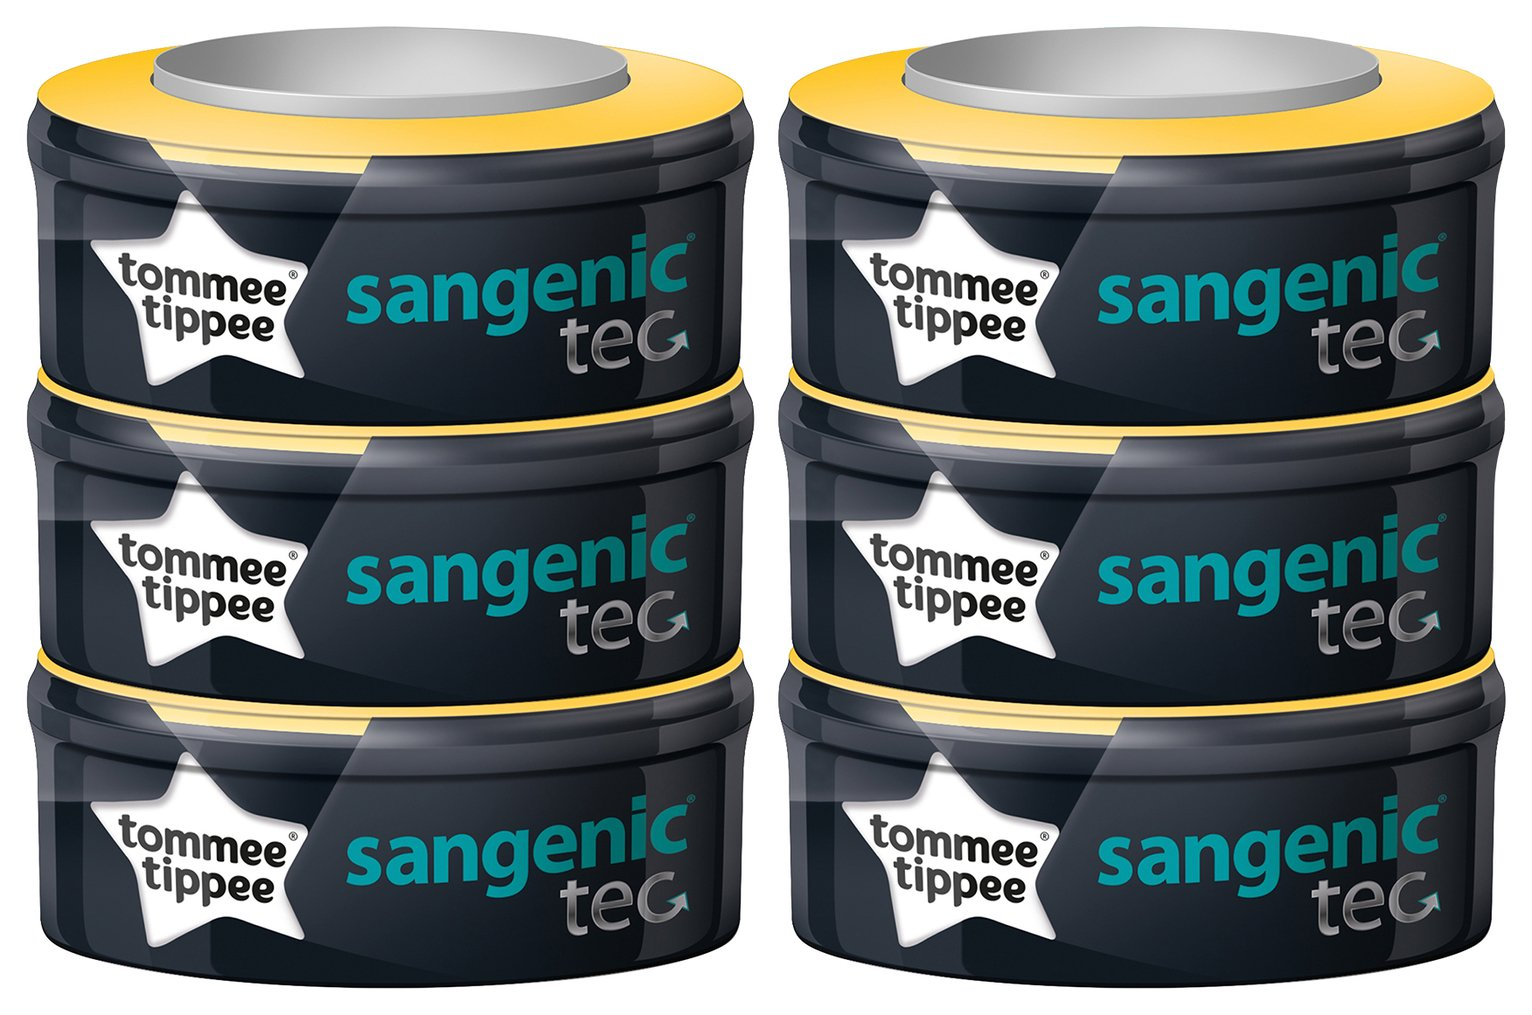 Tommee Tippee - Sangenic Tec Refills x 6